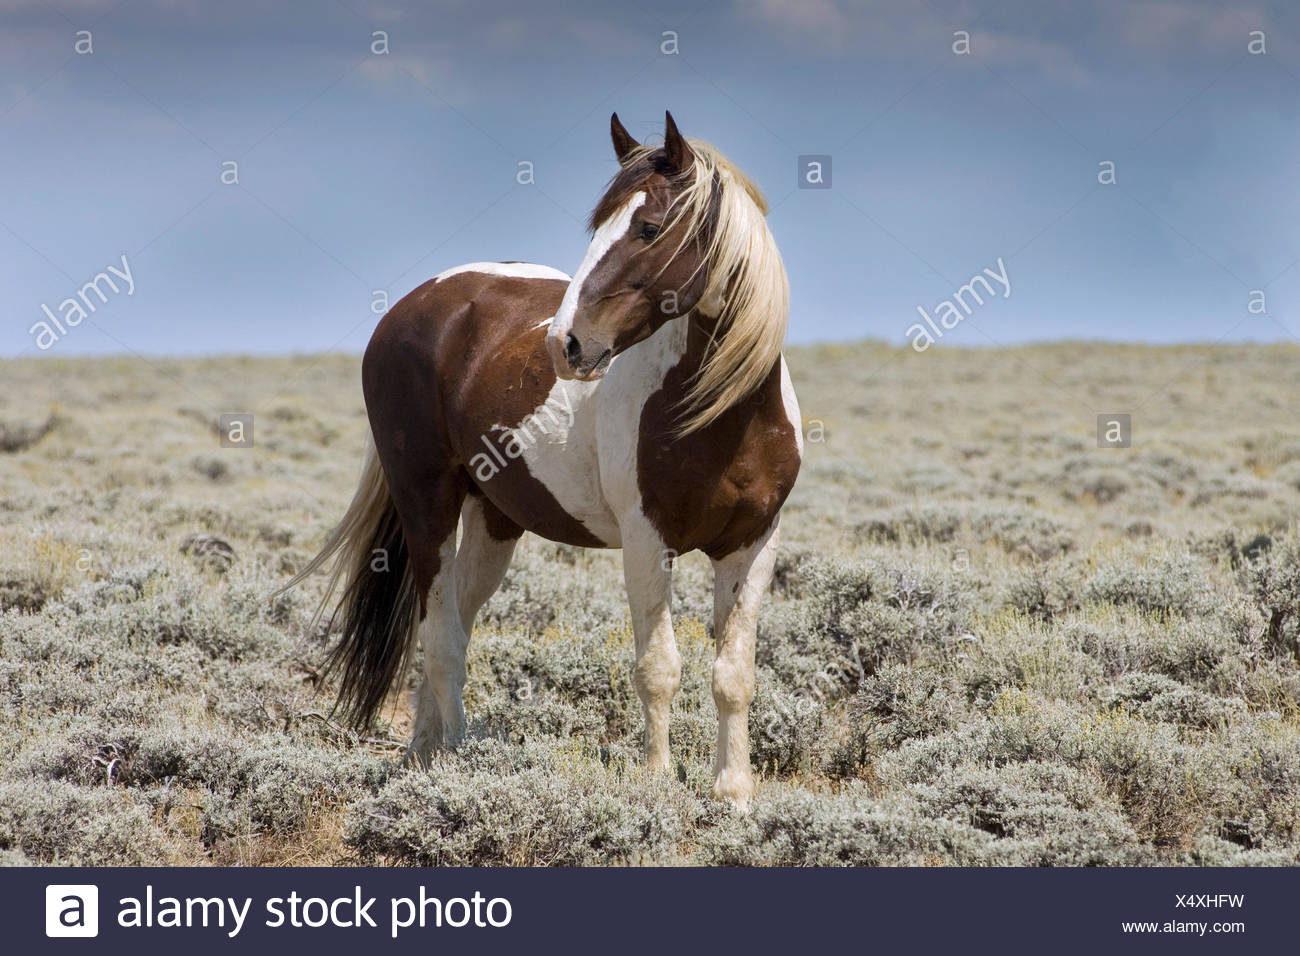 Mustang (Equus ferus caballus), stallion, piebald standing in prairie, Wyoming, USA Stock Photo